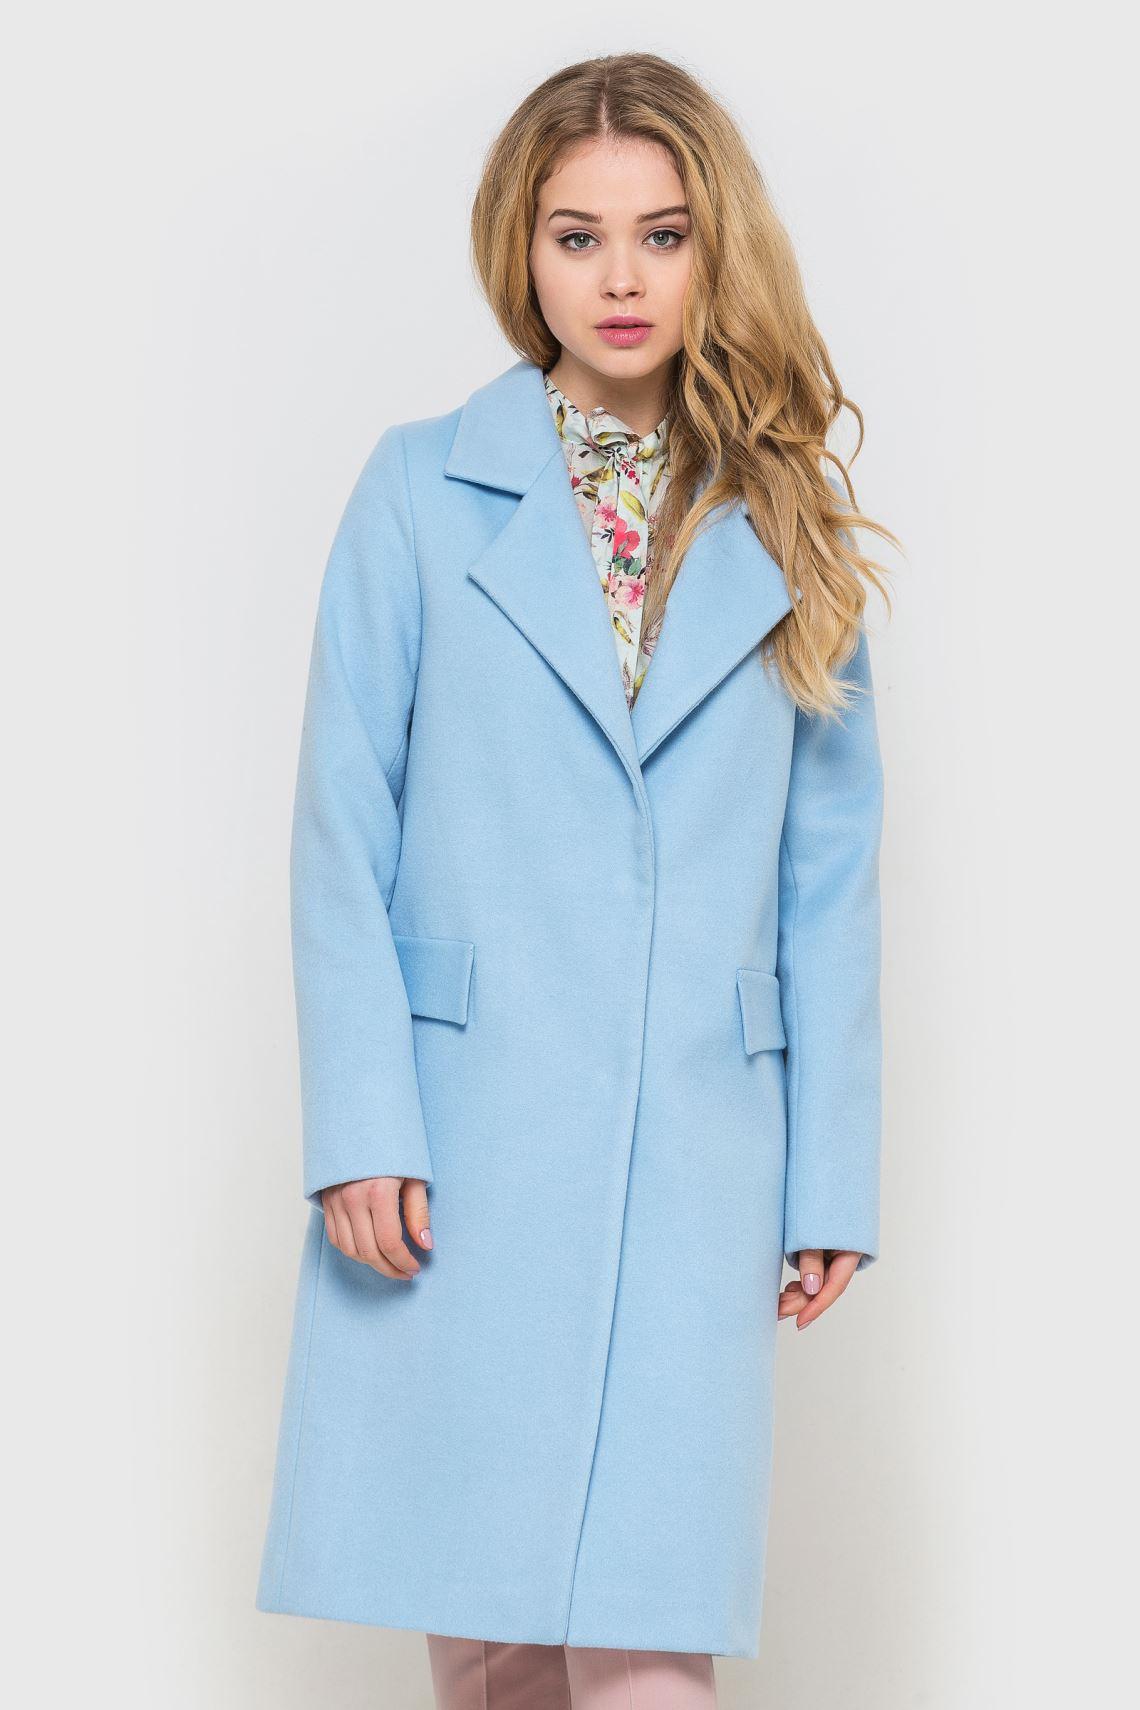 Пальто жіноче блакитне подовжене  85d2e1405b09b